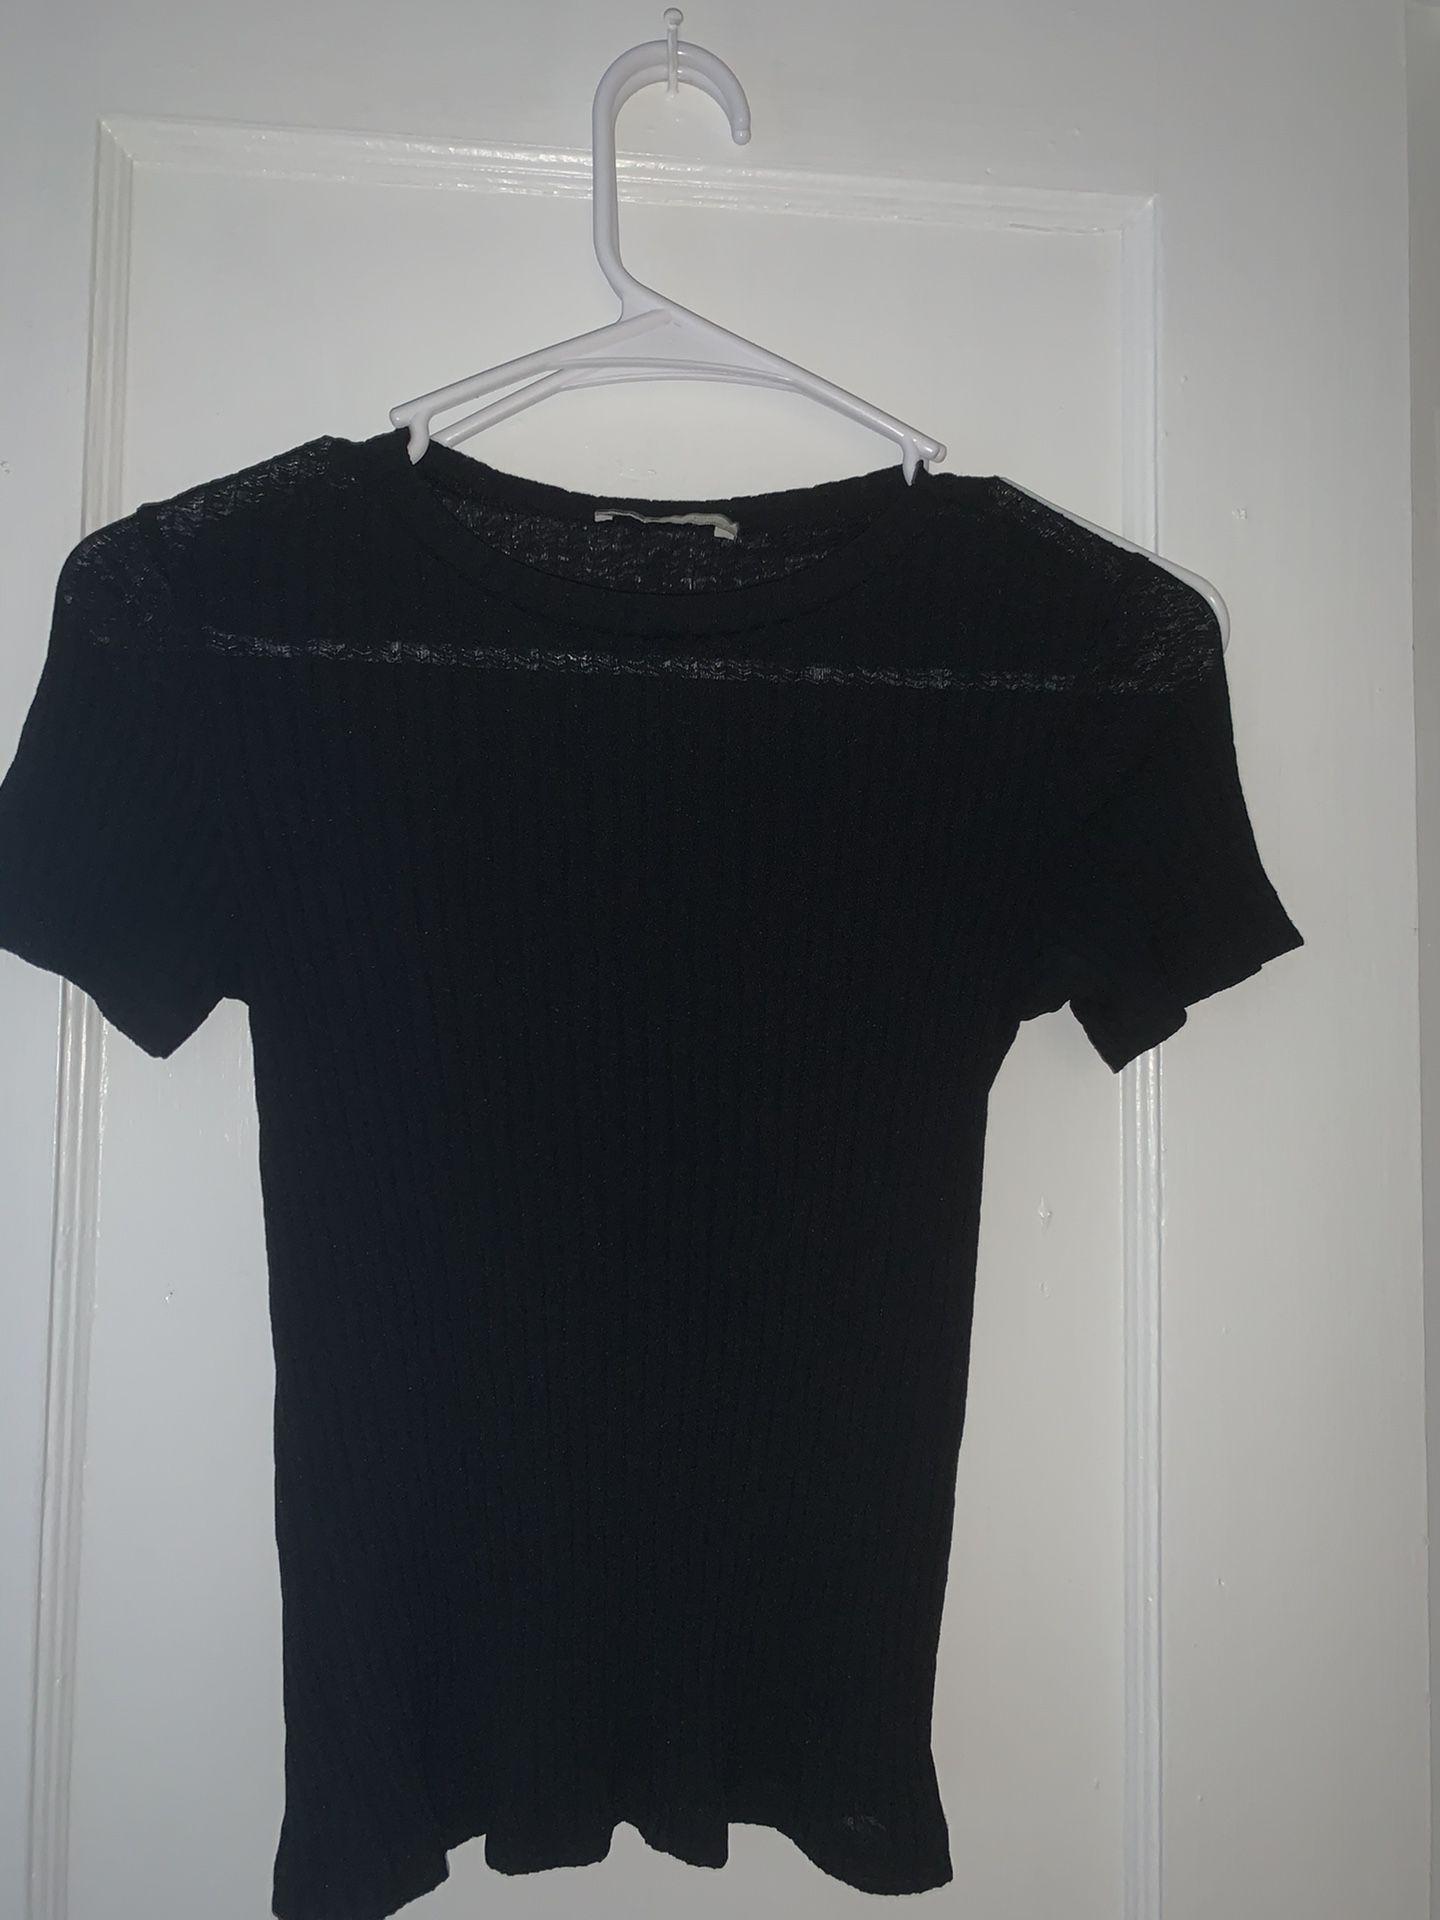 Zara women's top- size s